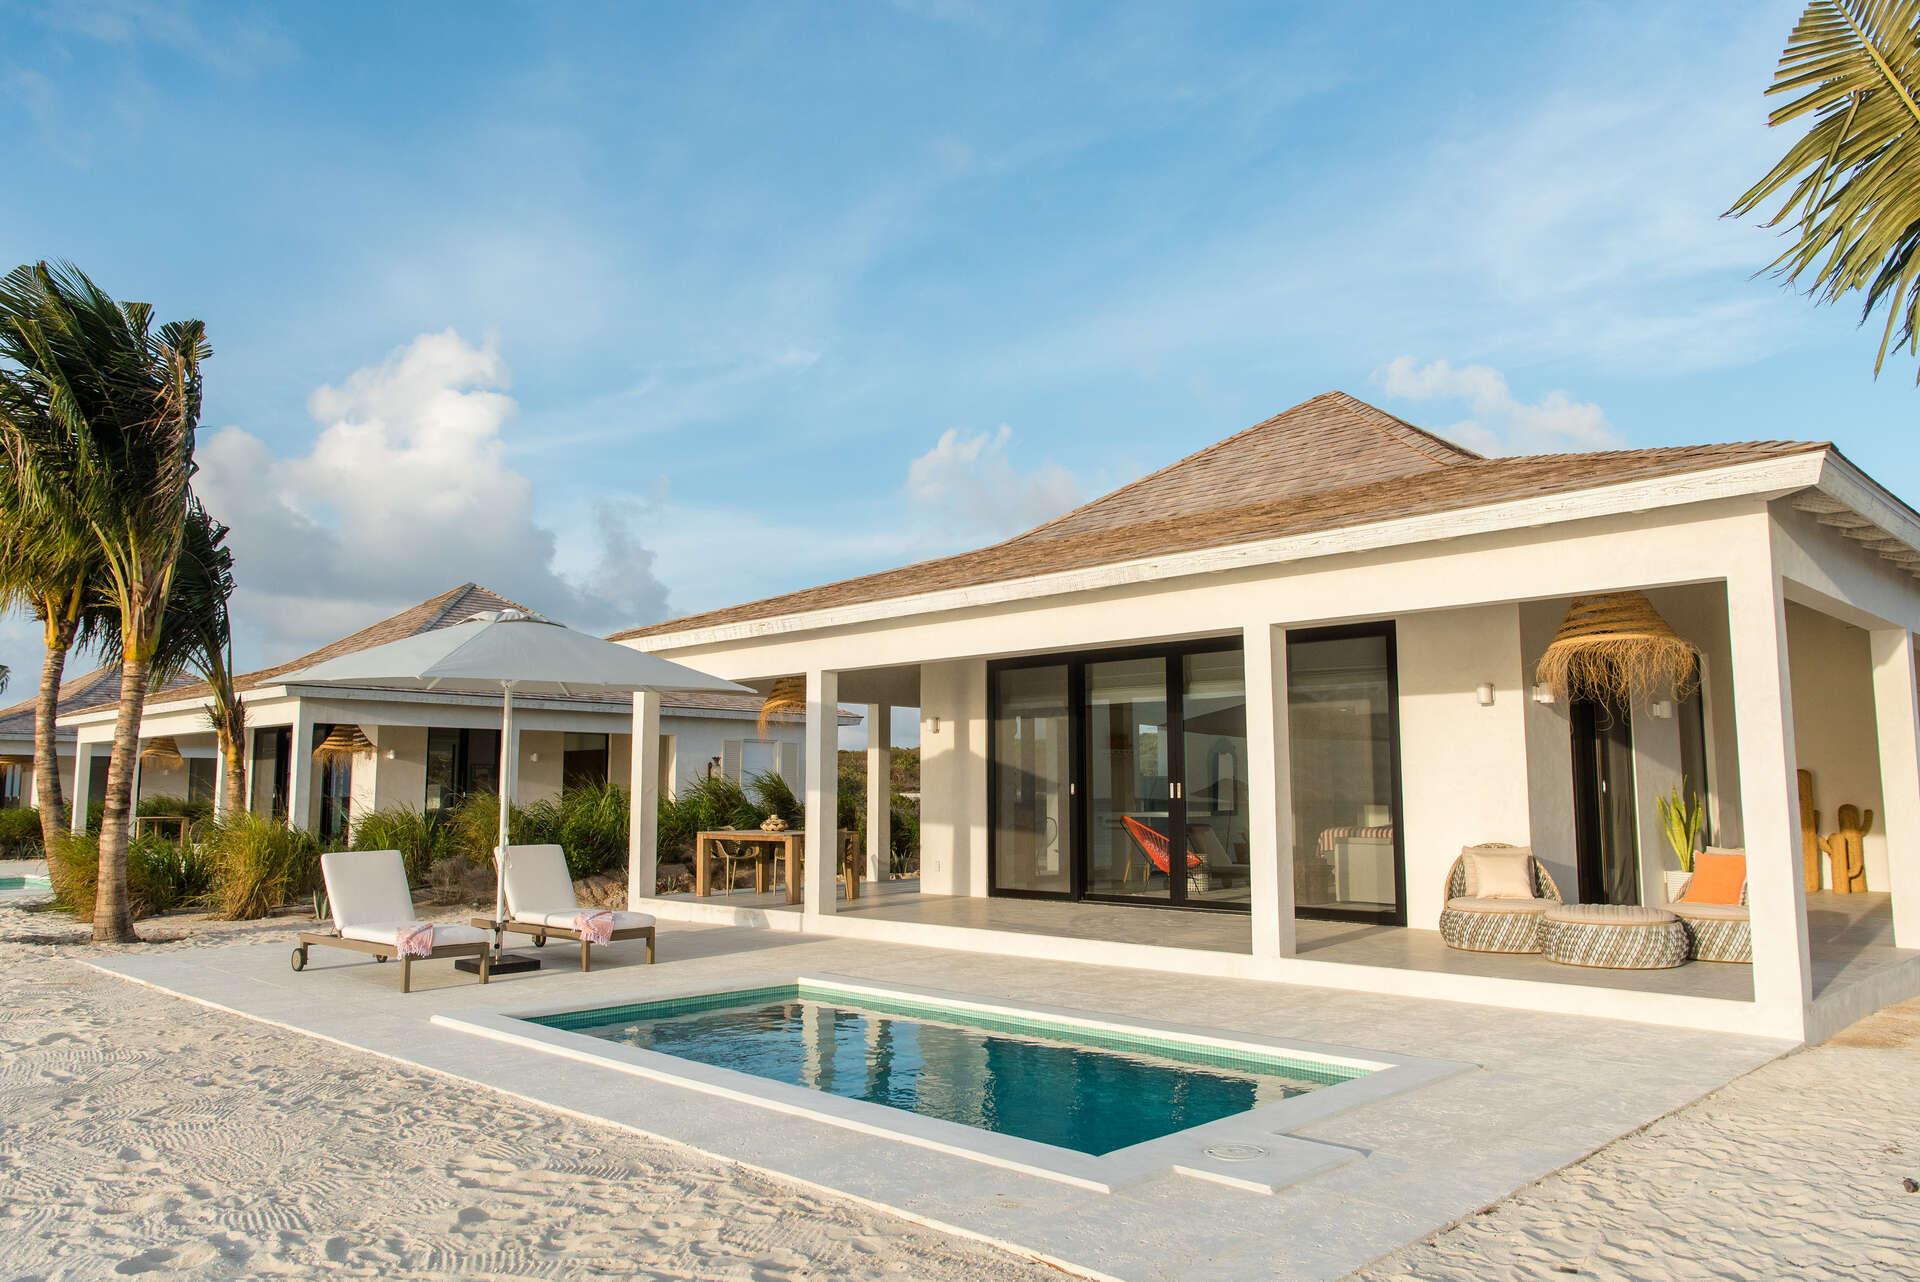 Luxury villa rentals caribbean - Turks and caicos - Ambergris cay - No location 4 - 1 BDM Beachfront - Image 1/19